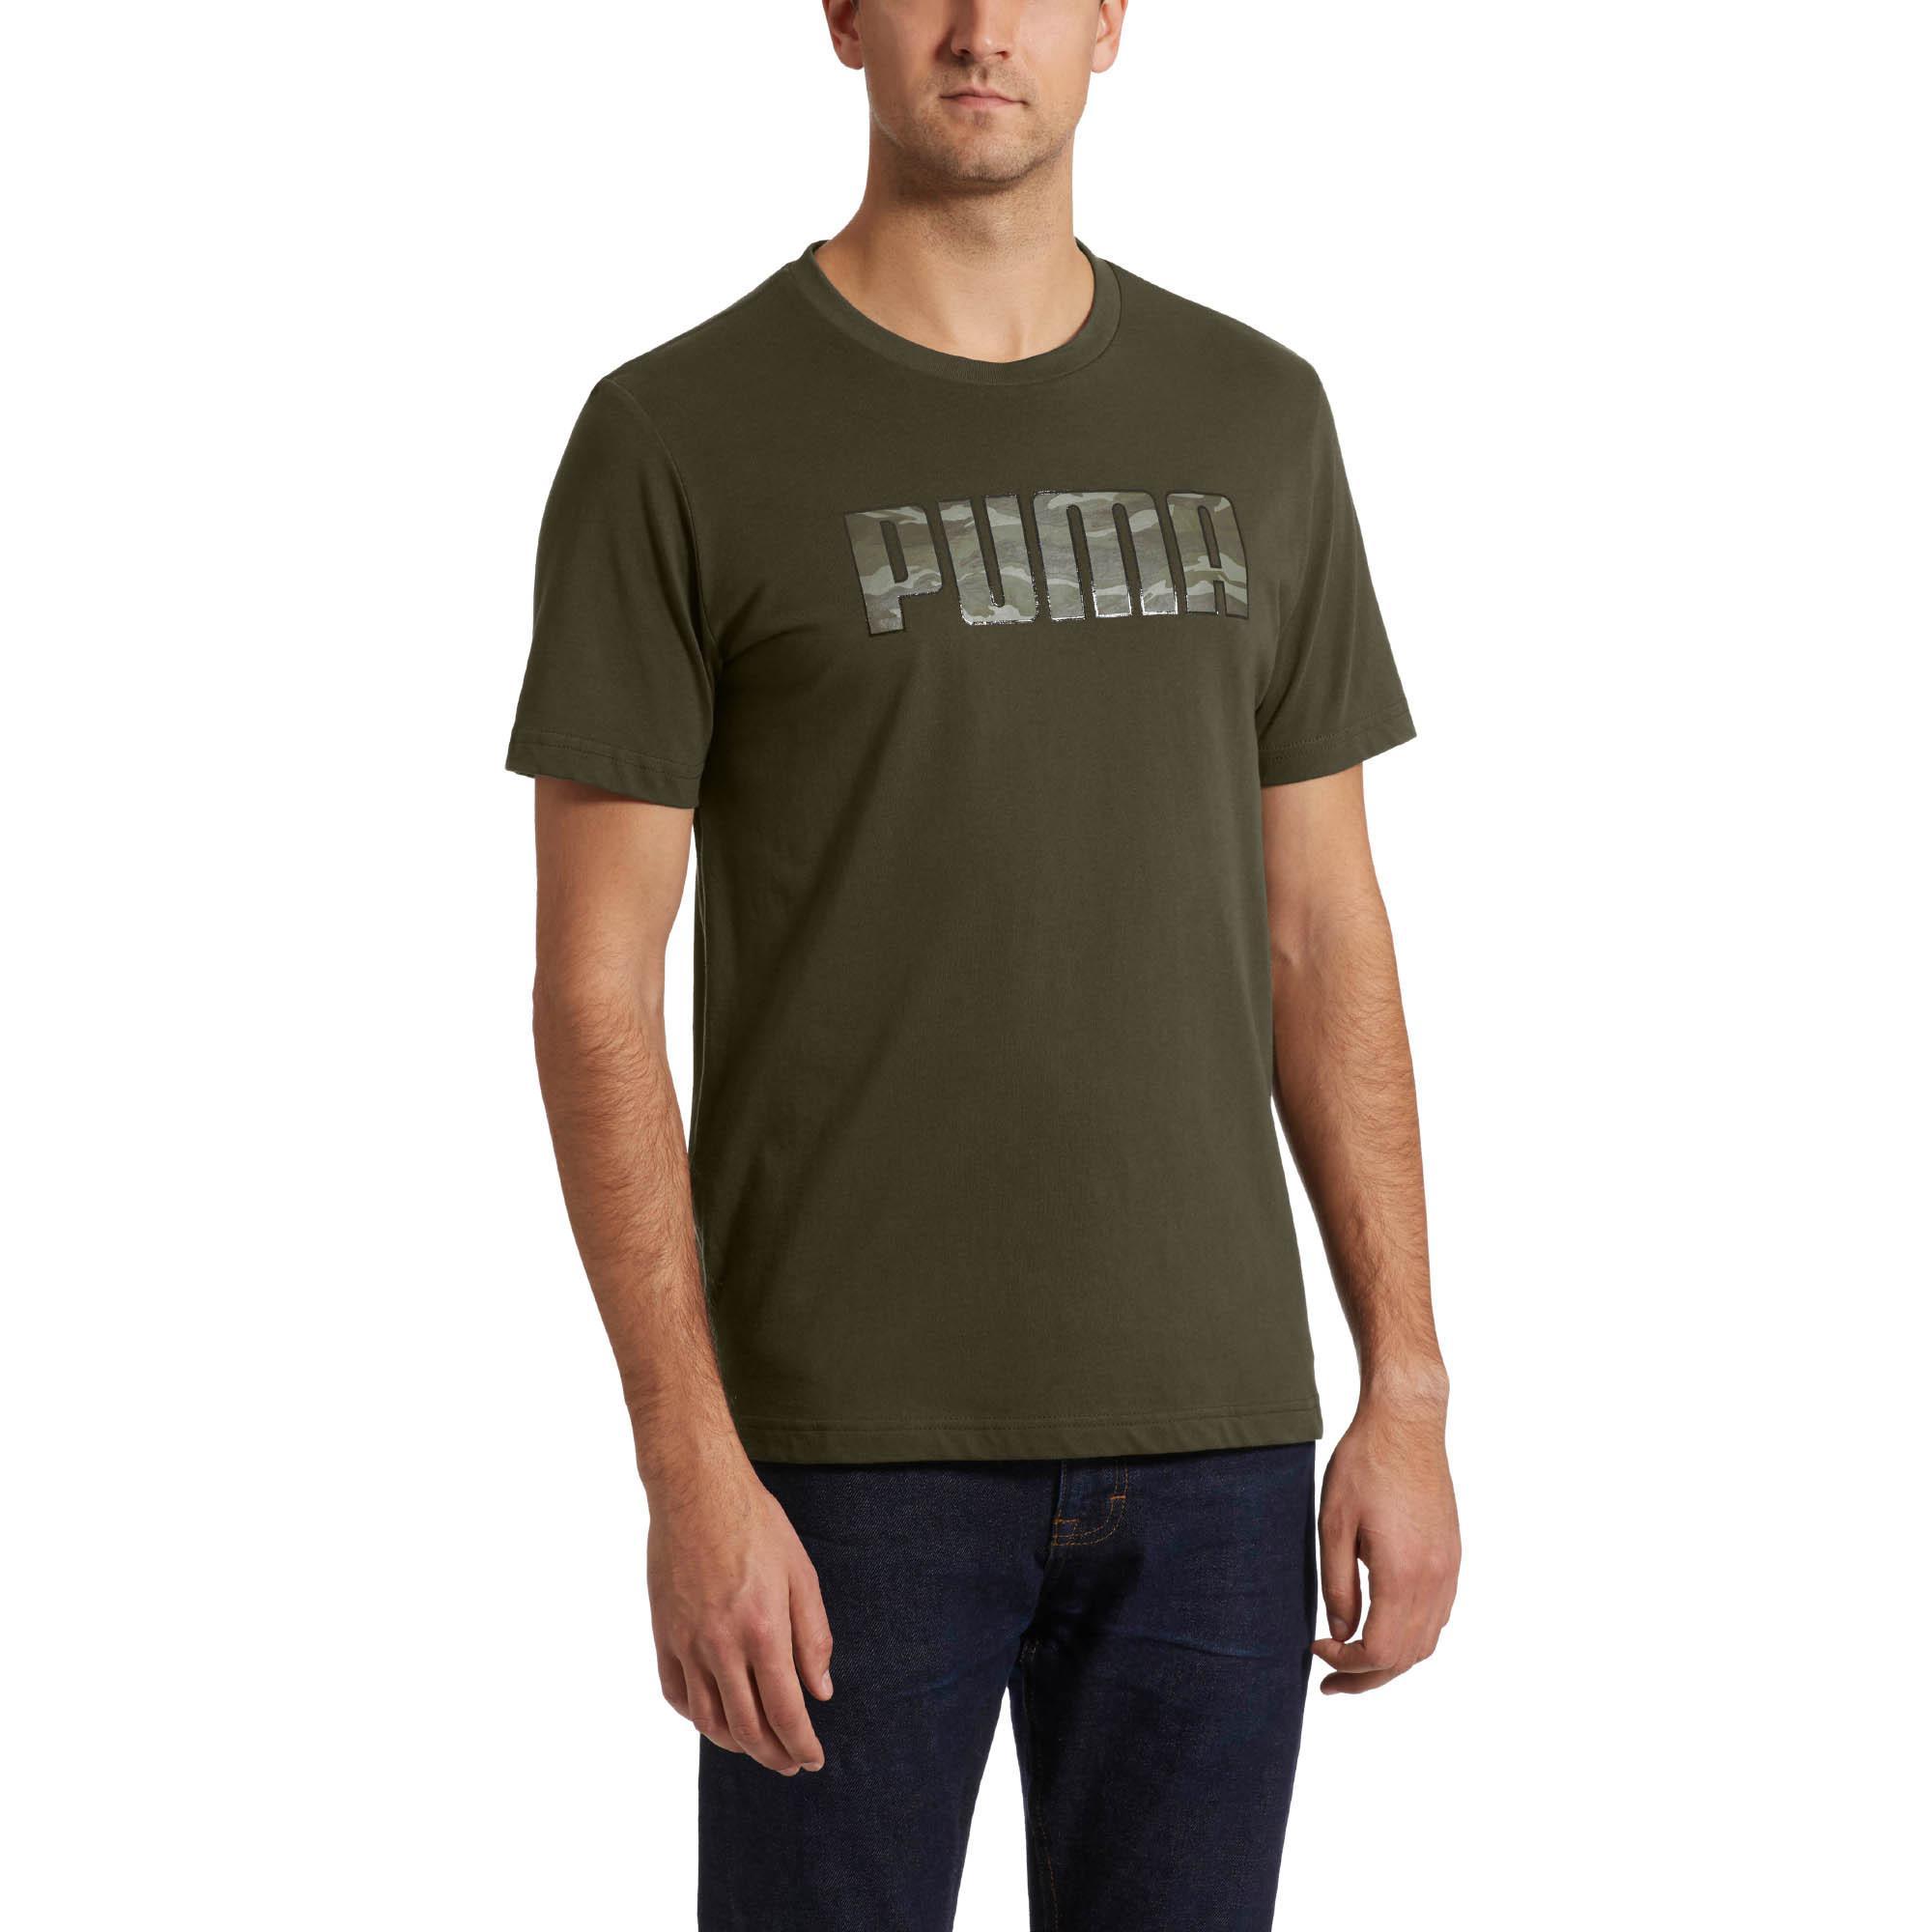 b25ae411189 PUMA - Green Camo Logo T-shirt for Men - Lyst. View fullscreen